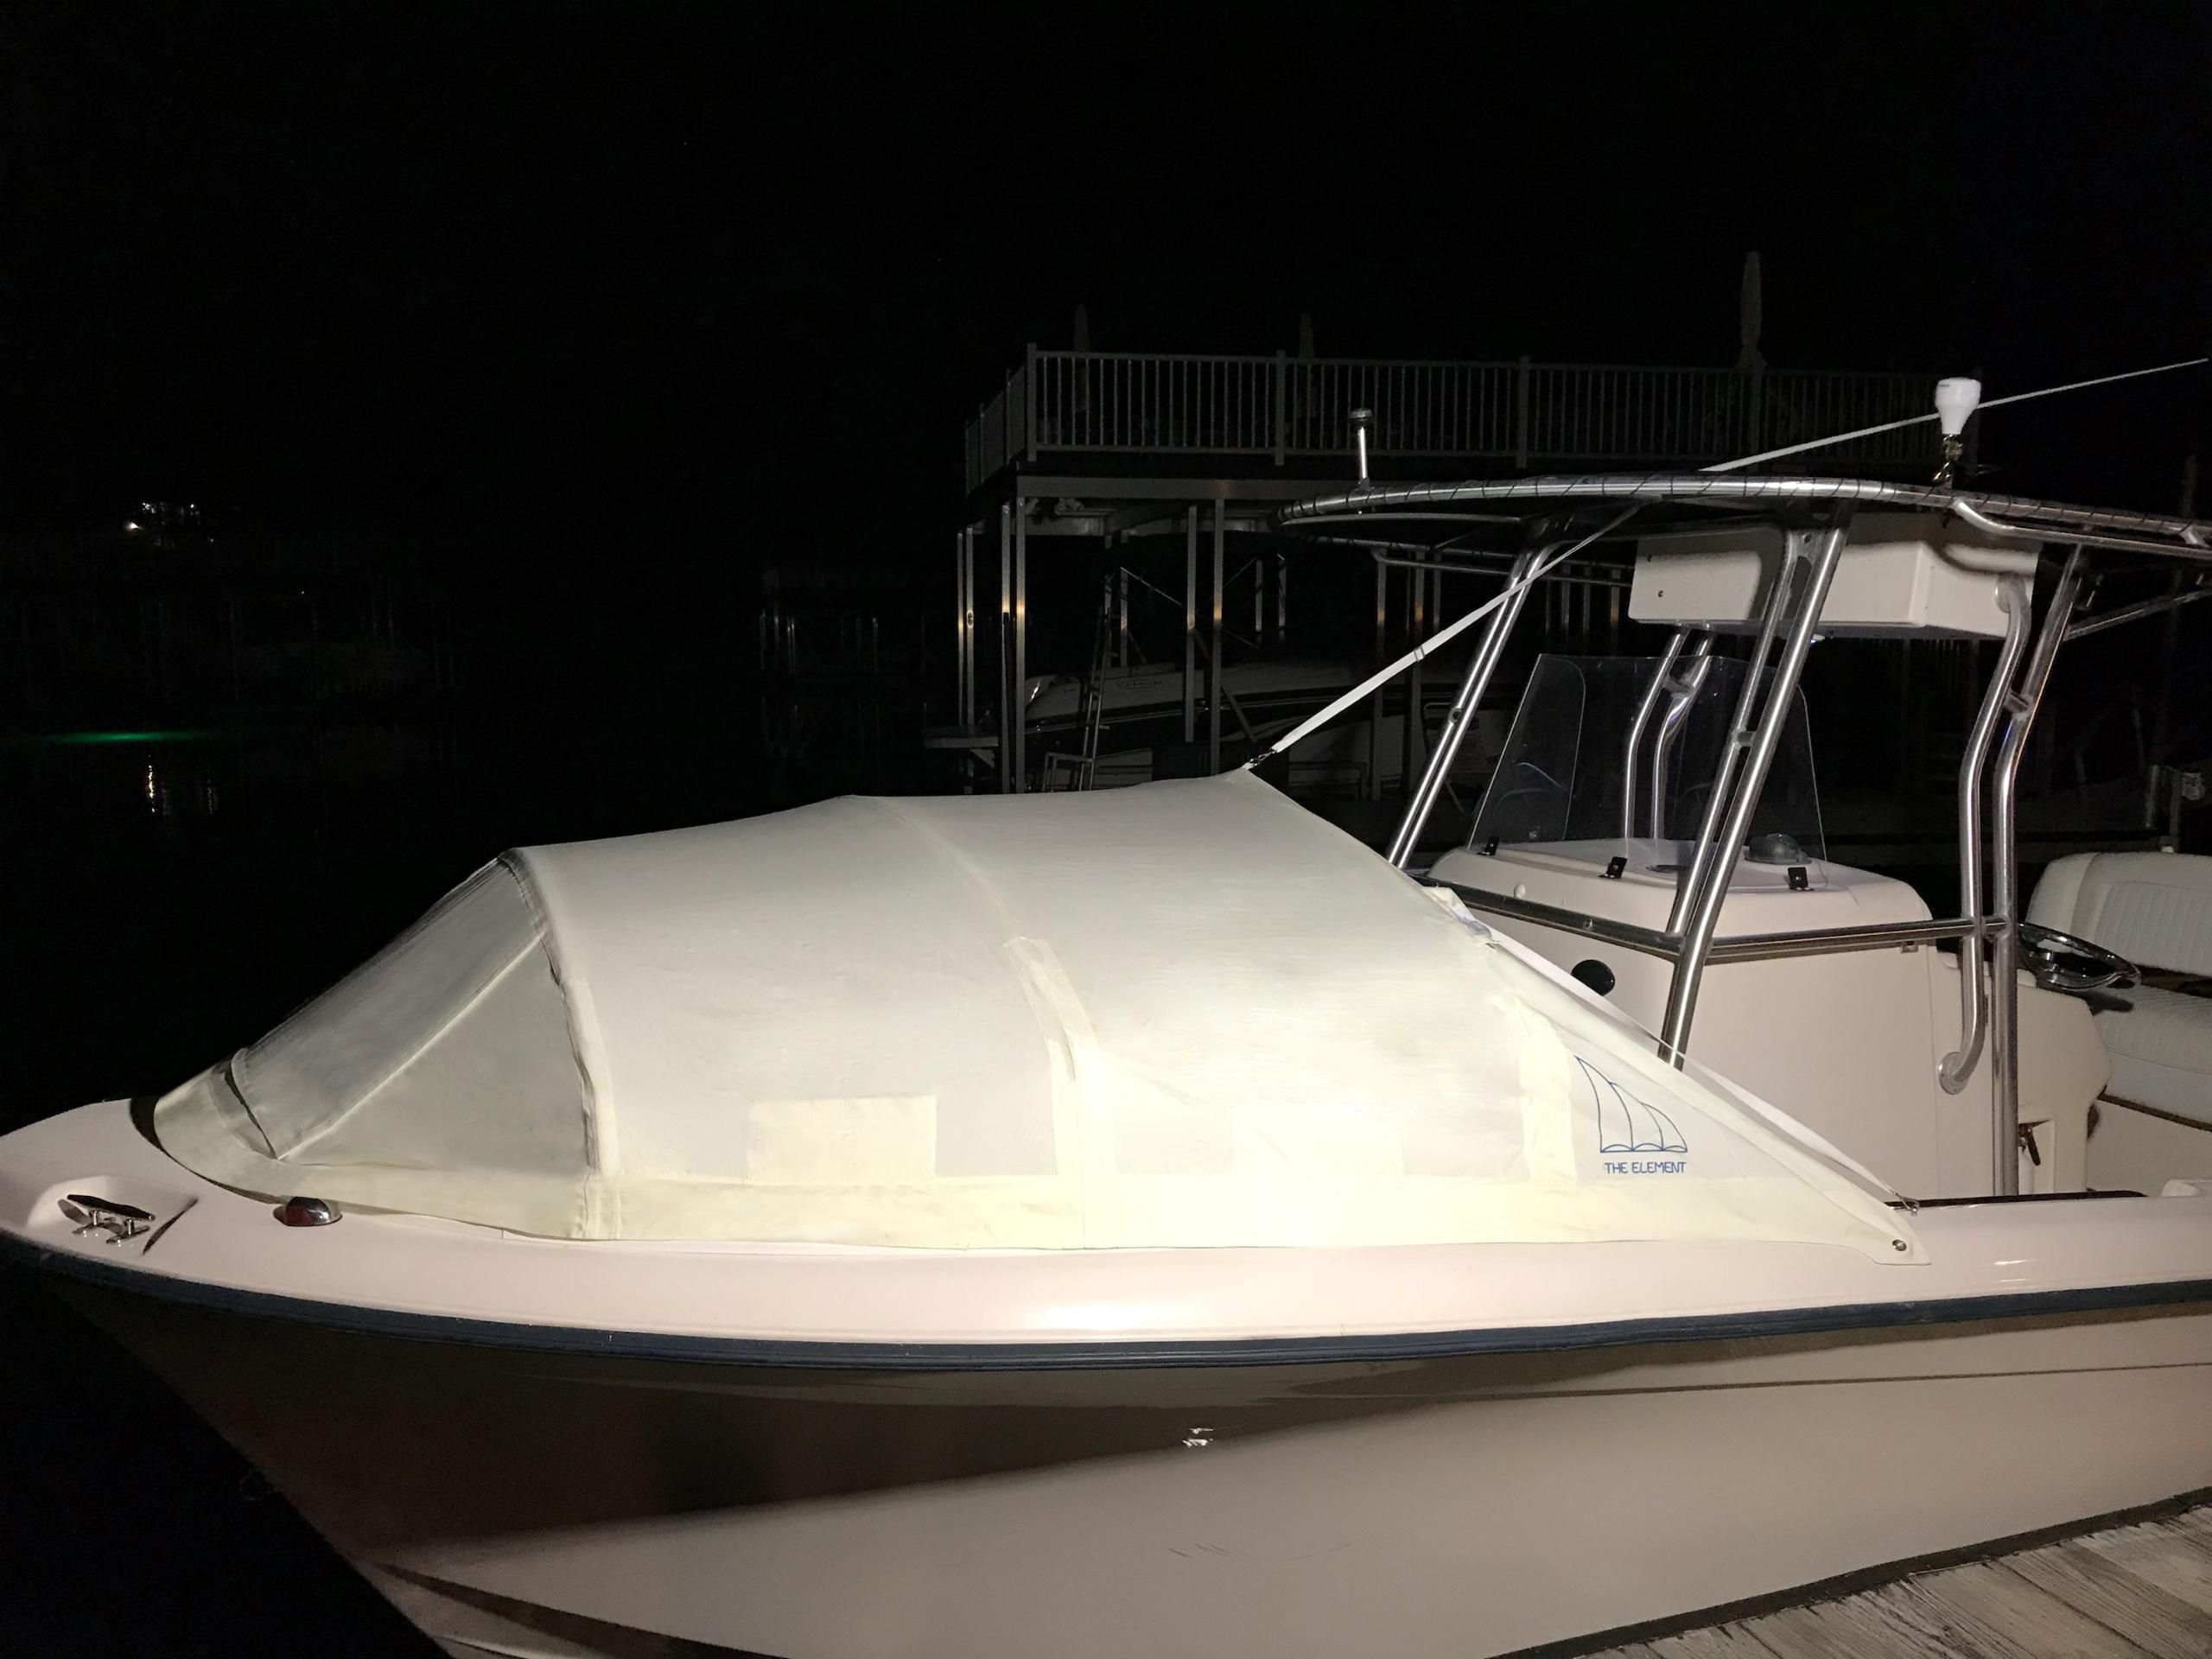 42++ Smoker craft boats models information